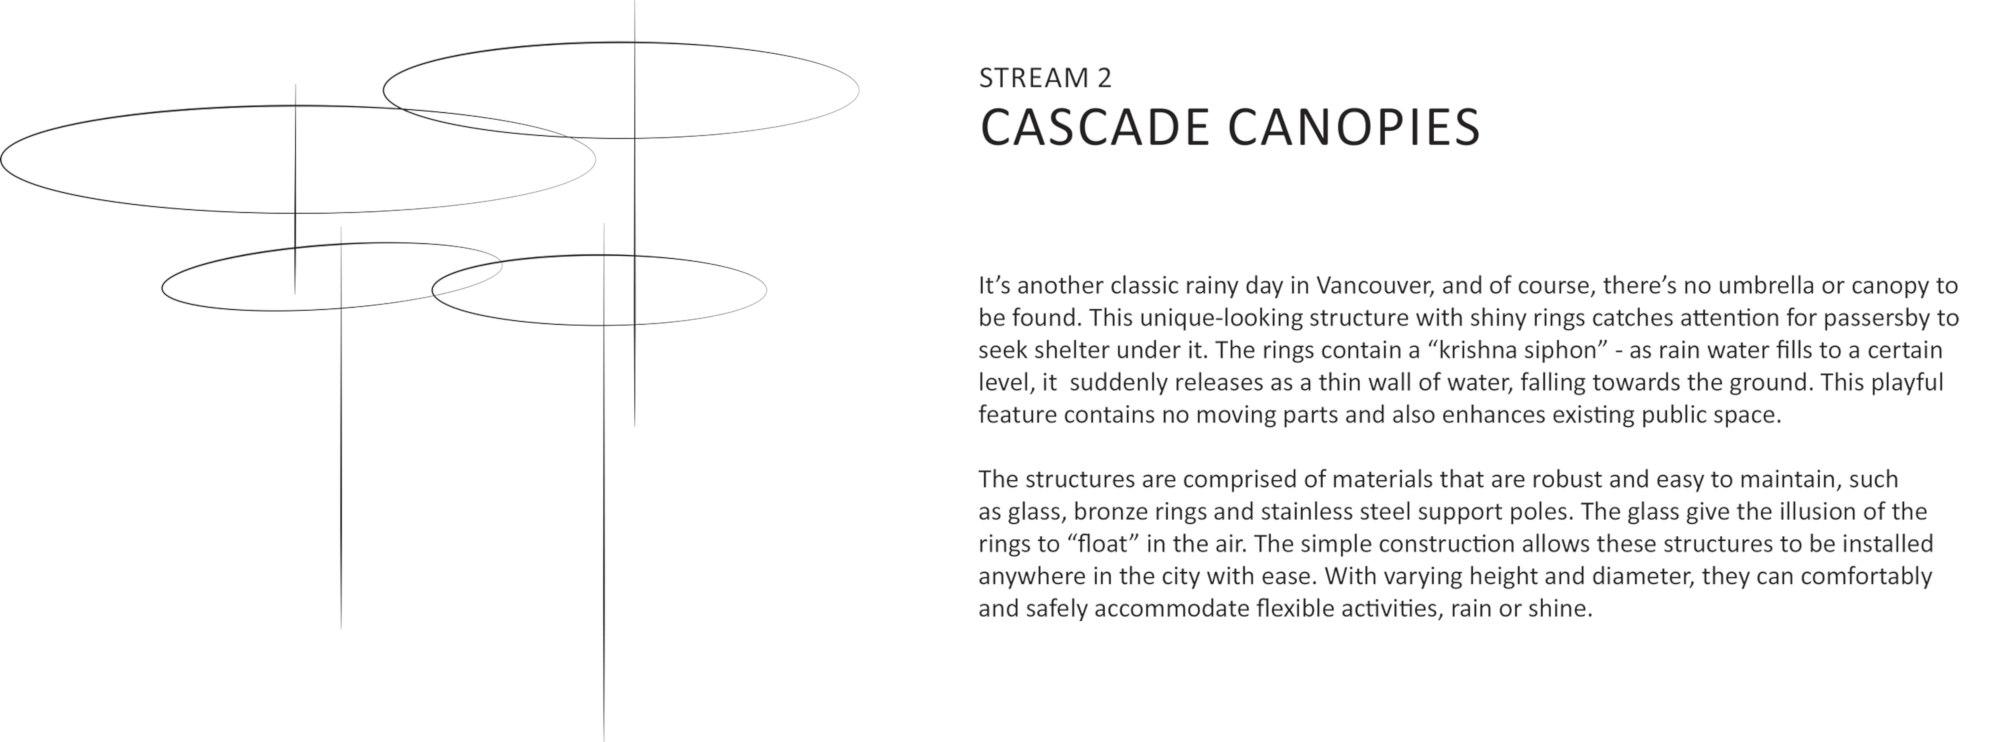 B2 - Cascade Canopies - stream 2 - 11-1.jpg